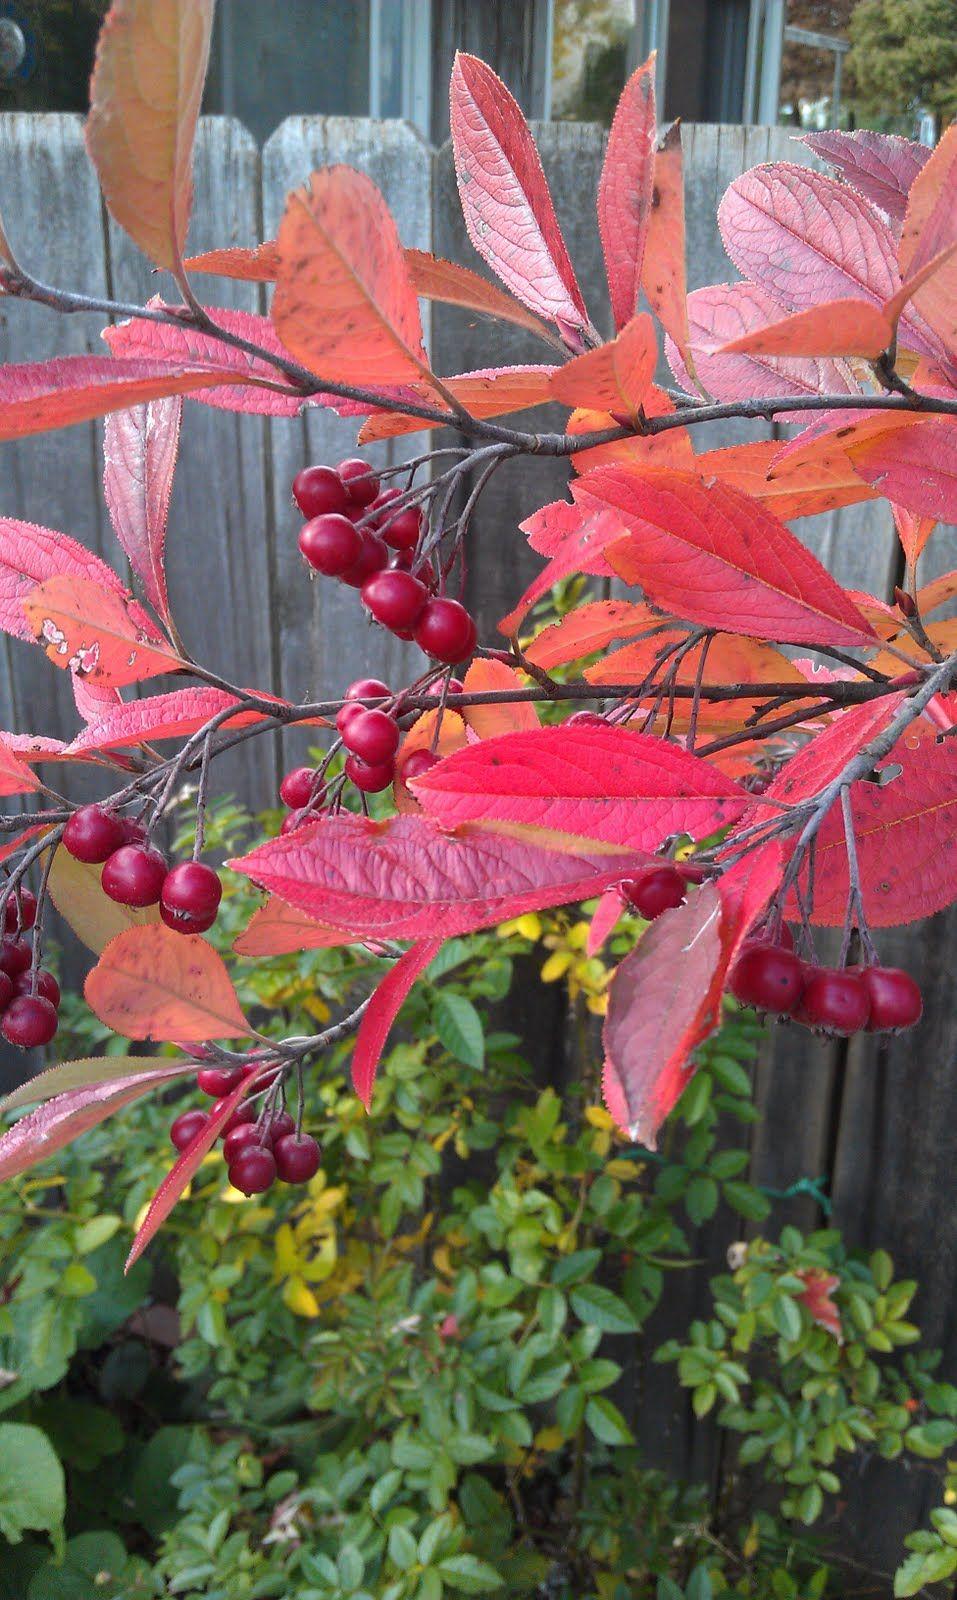 Chokeberry aronia arbutifolia ubrilliantissimau provides food for